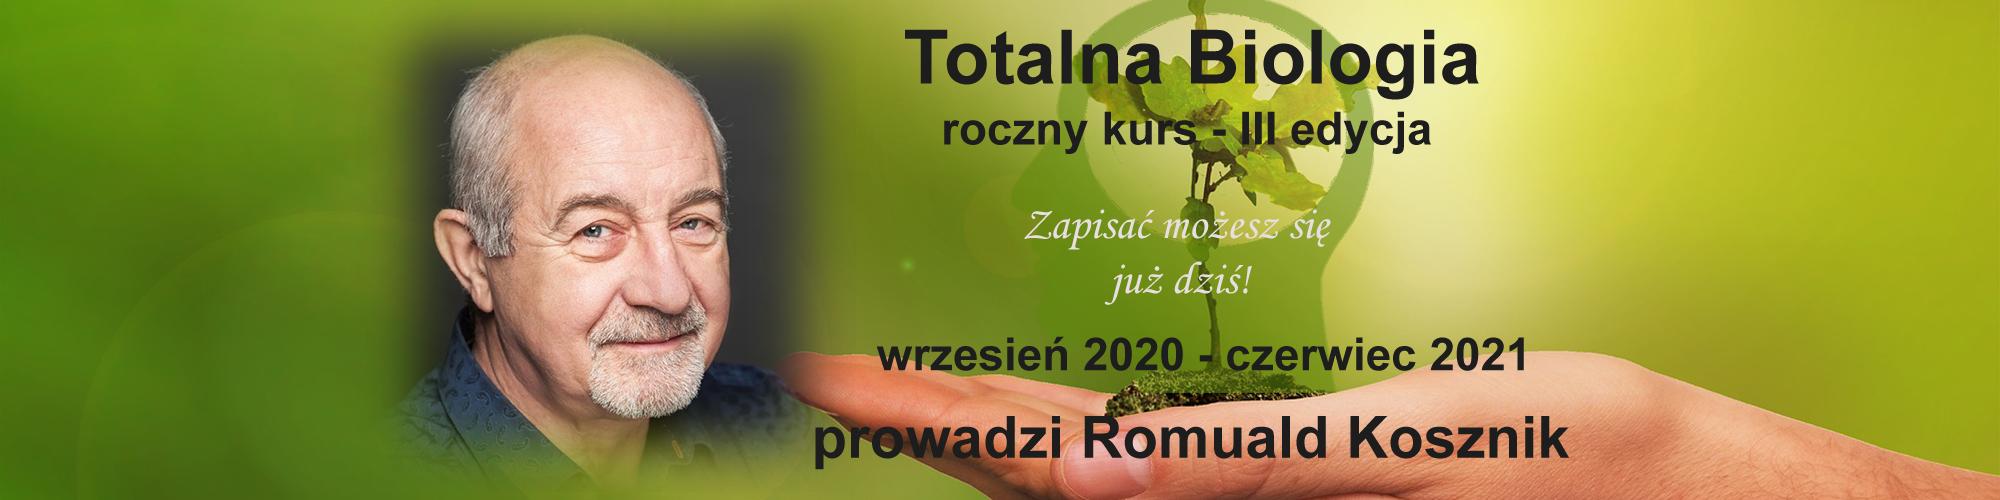 totalnabiologia3-banner